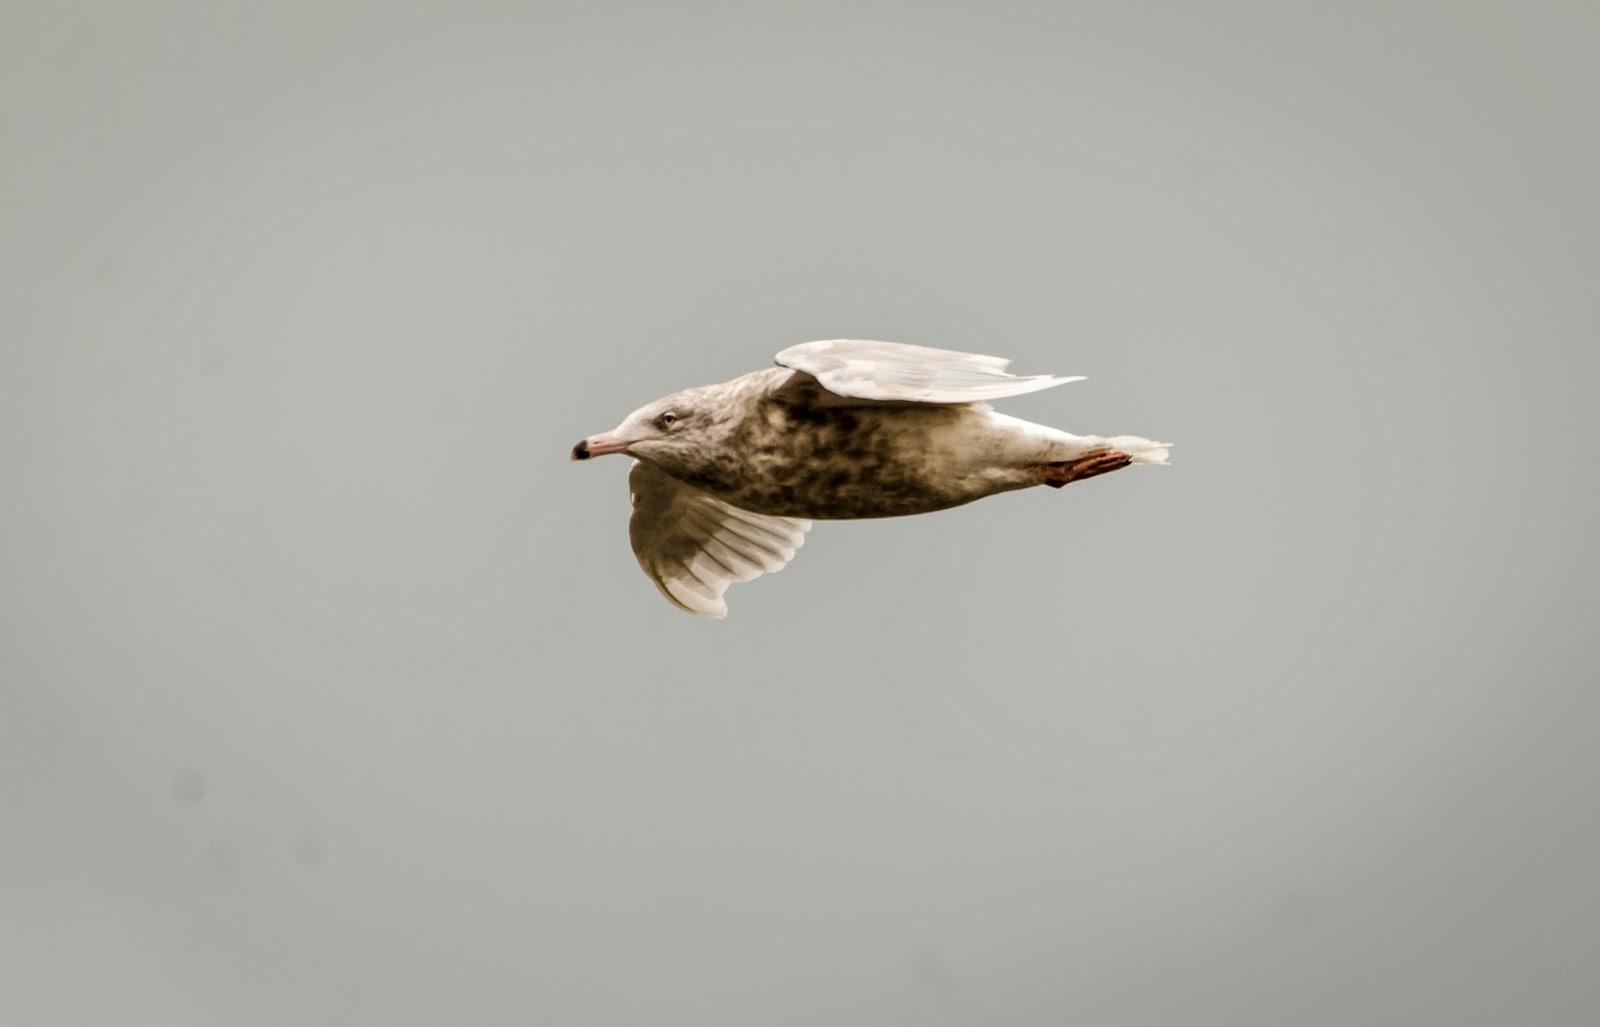 svettitel svalbard spitzberg randonnée oiseaux